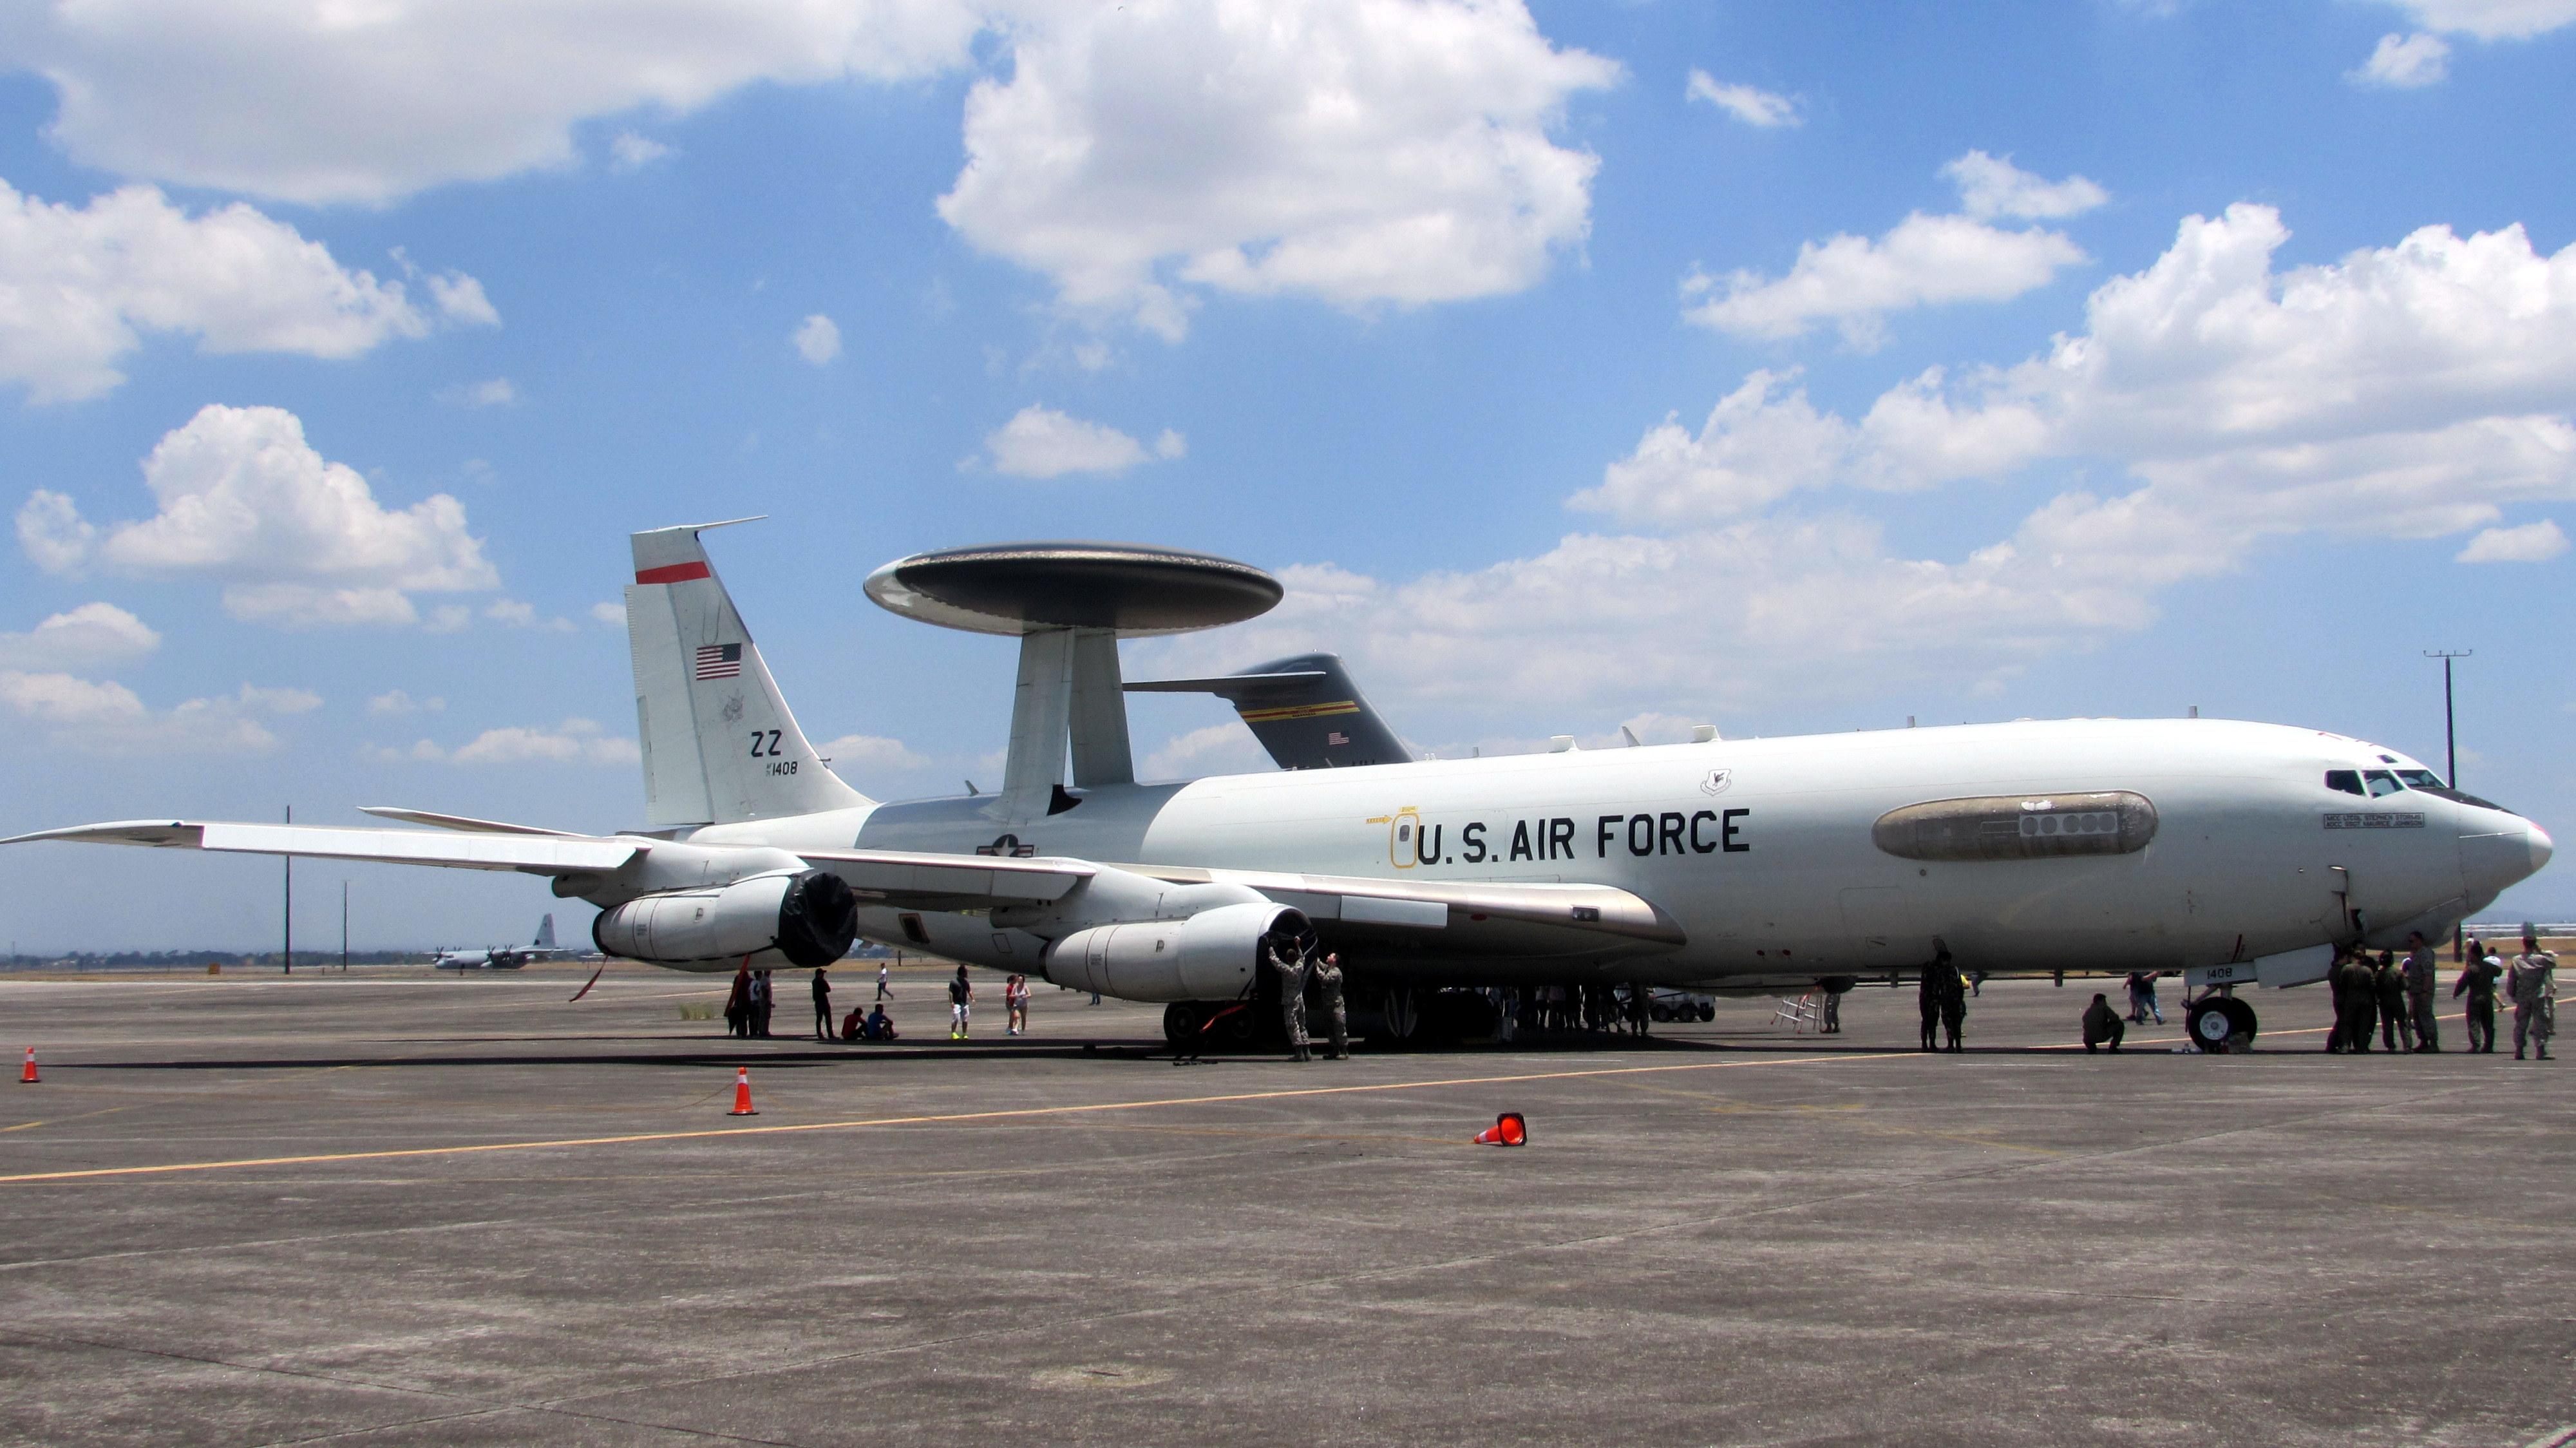 File:E-3 AWACS (Balikatan 2016).JPG - Wikimedia Commons